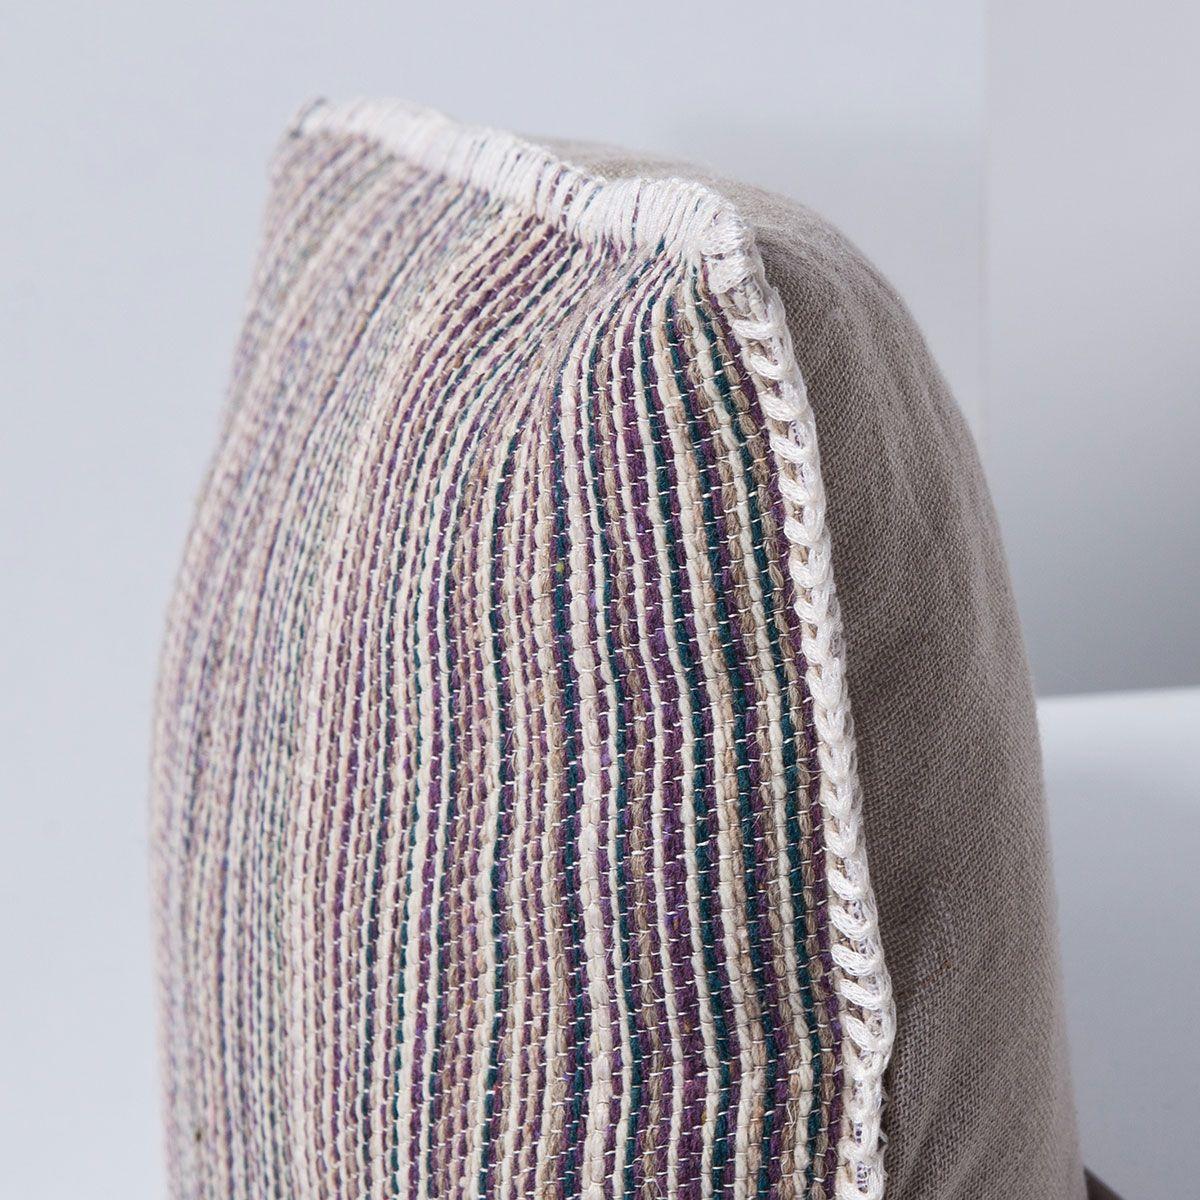 Cushion Wool / Ala - D95 - 40 x 40 cm